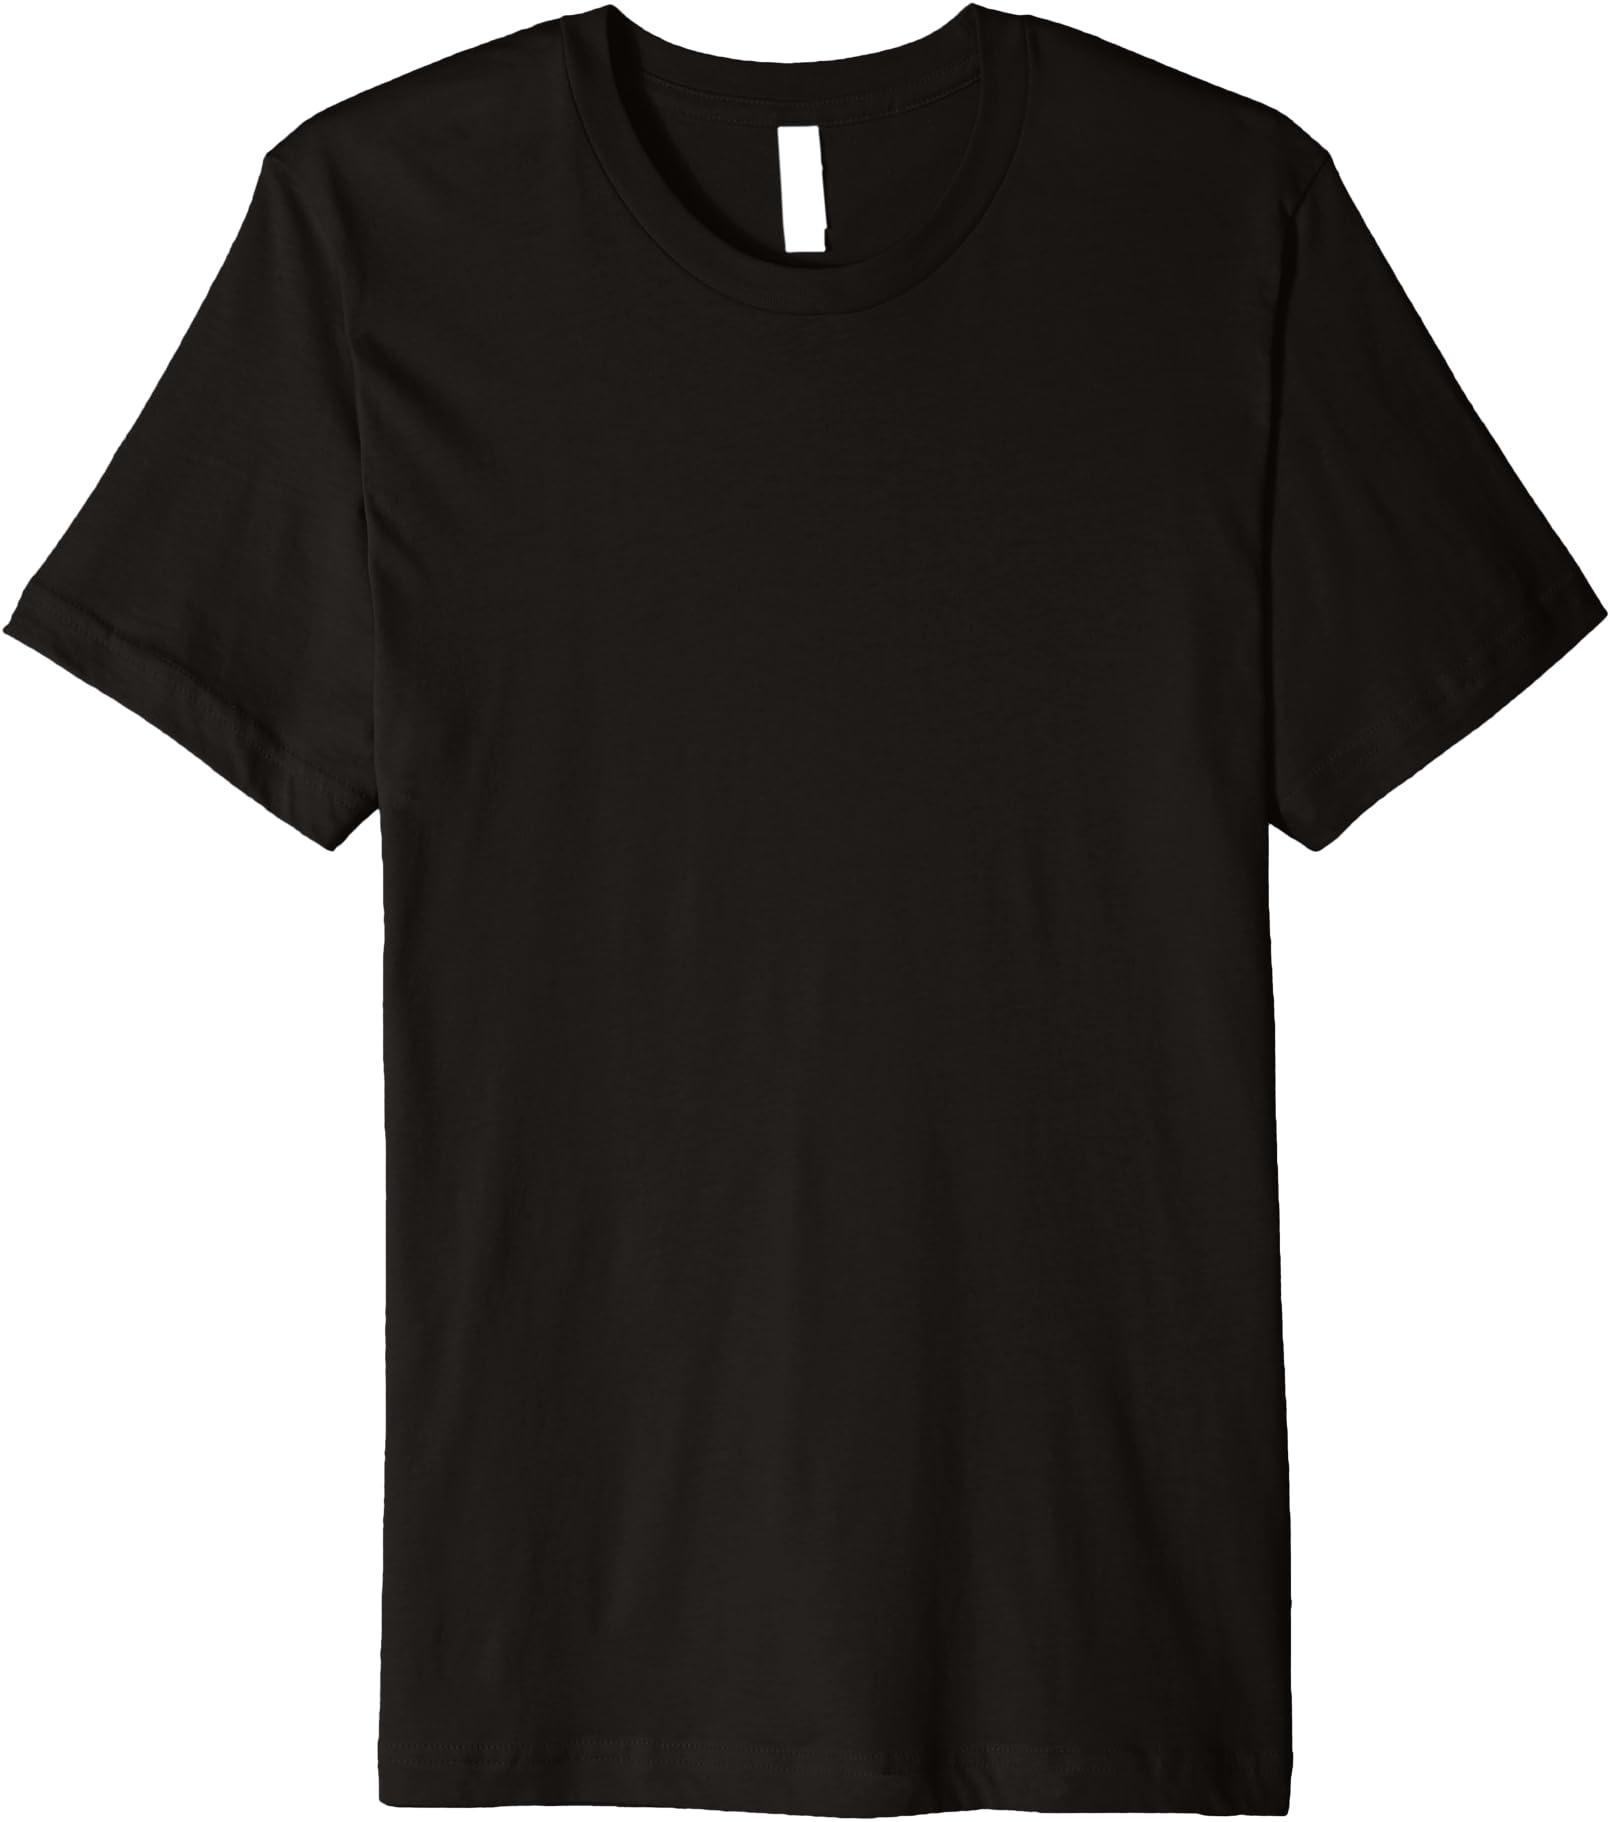 Made In USA Atlanta Vintage Eagle T-shirt